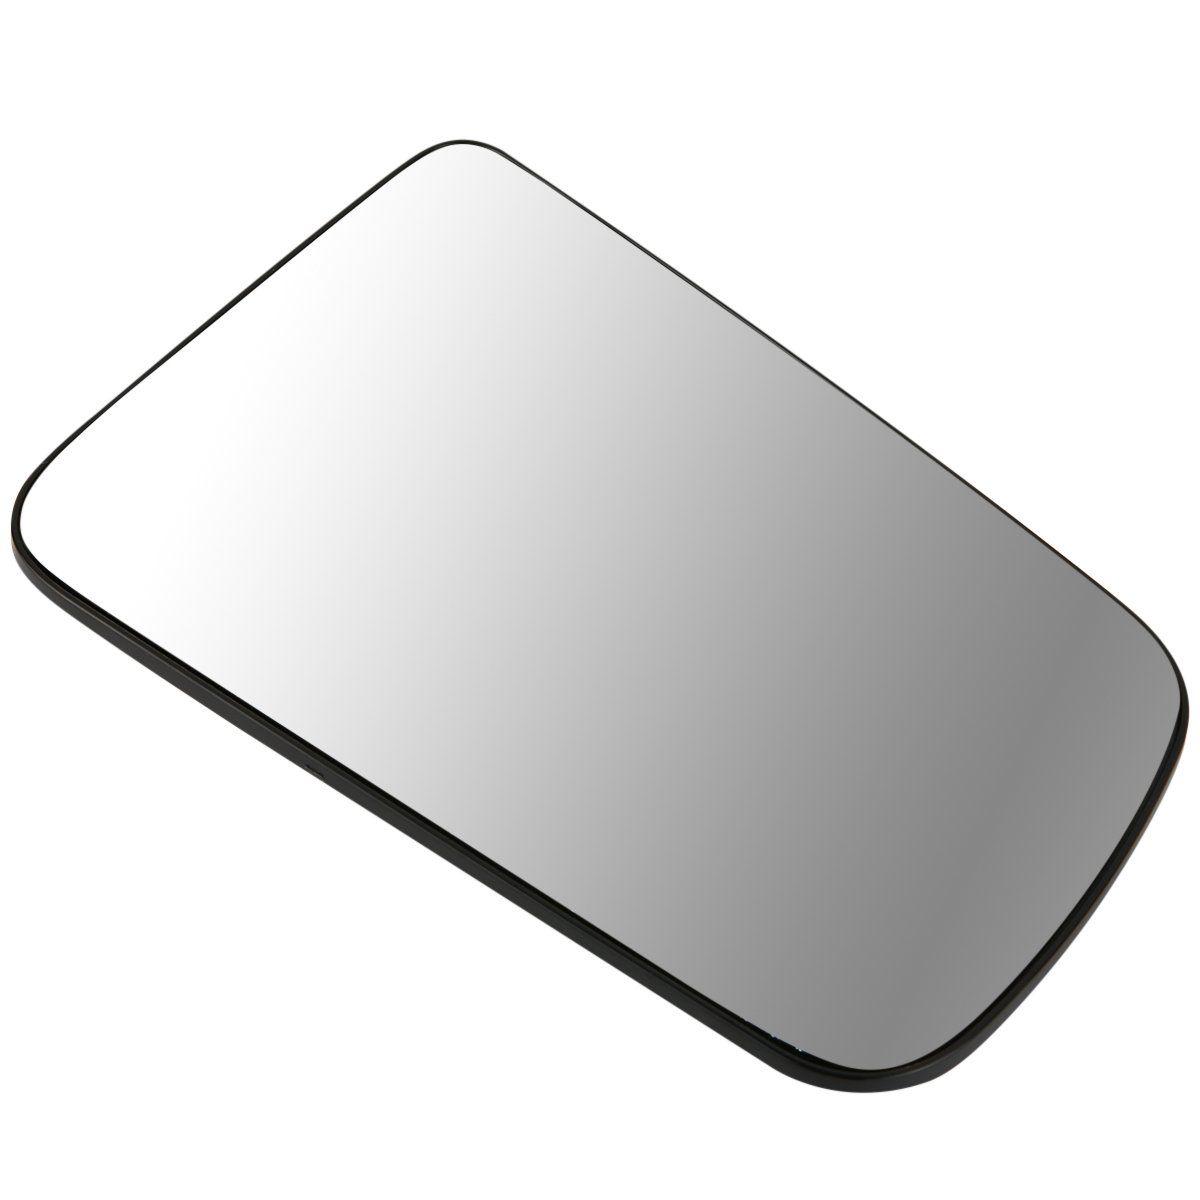 08 11 Ford Focus Right Passenger Side Door Mirror Glass 8s4z17k707a In 2021 Glass Mirror Mirror House Mirror Door